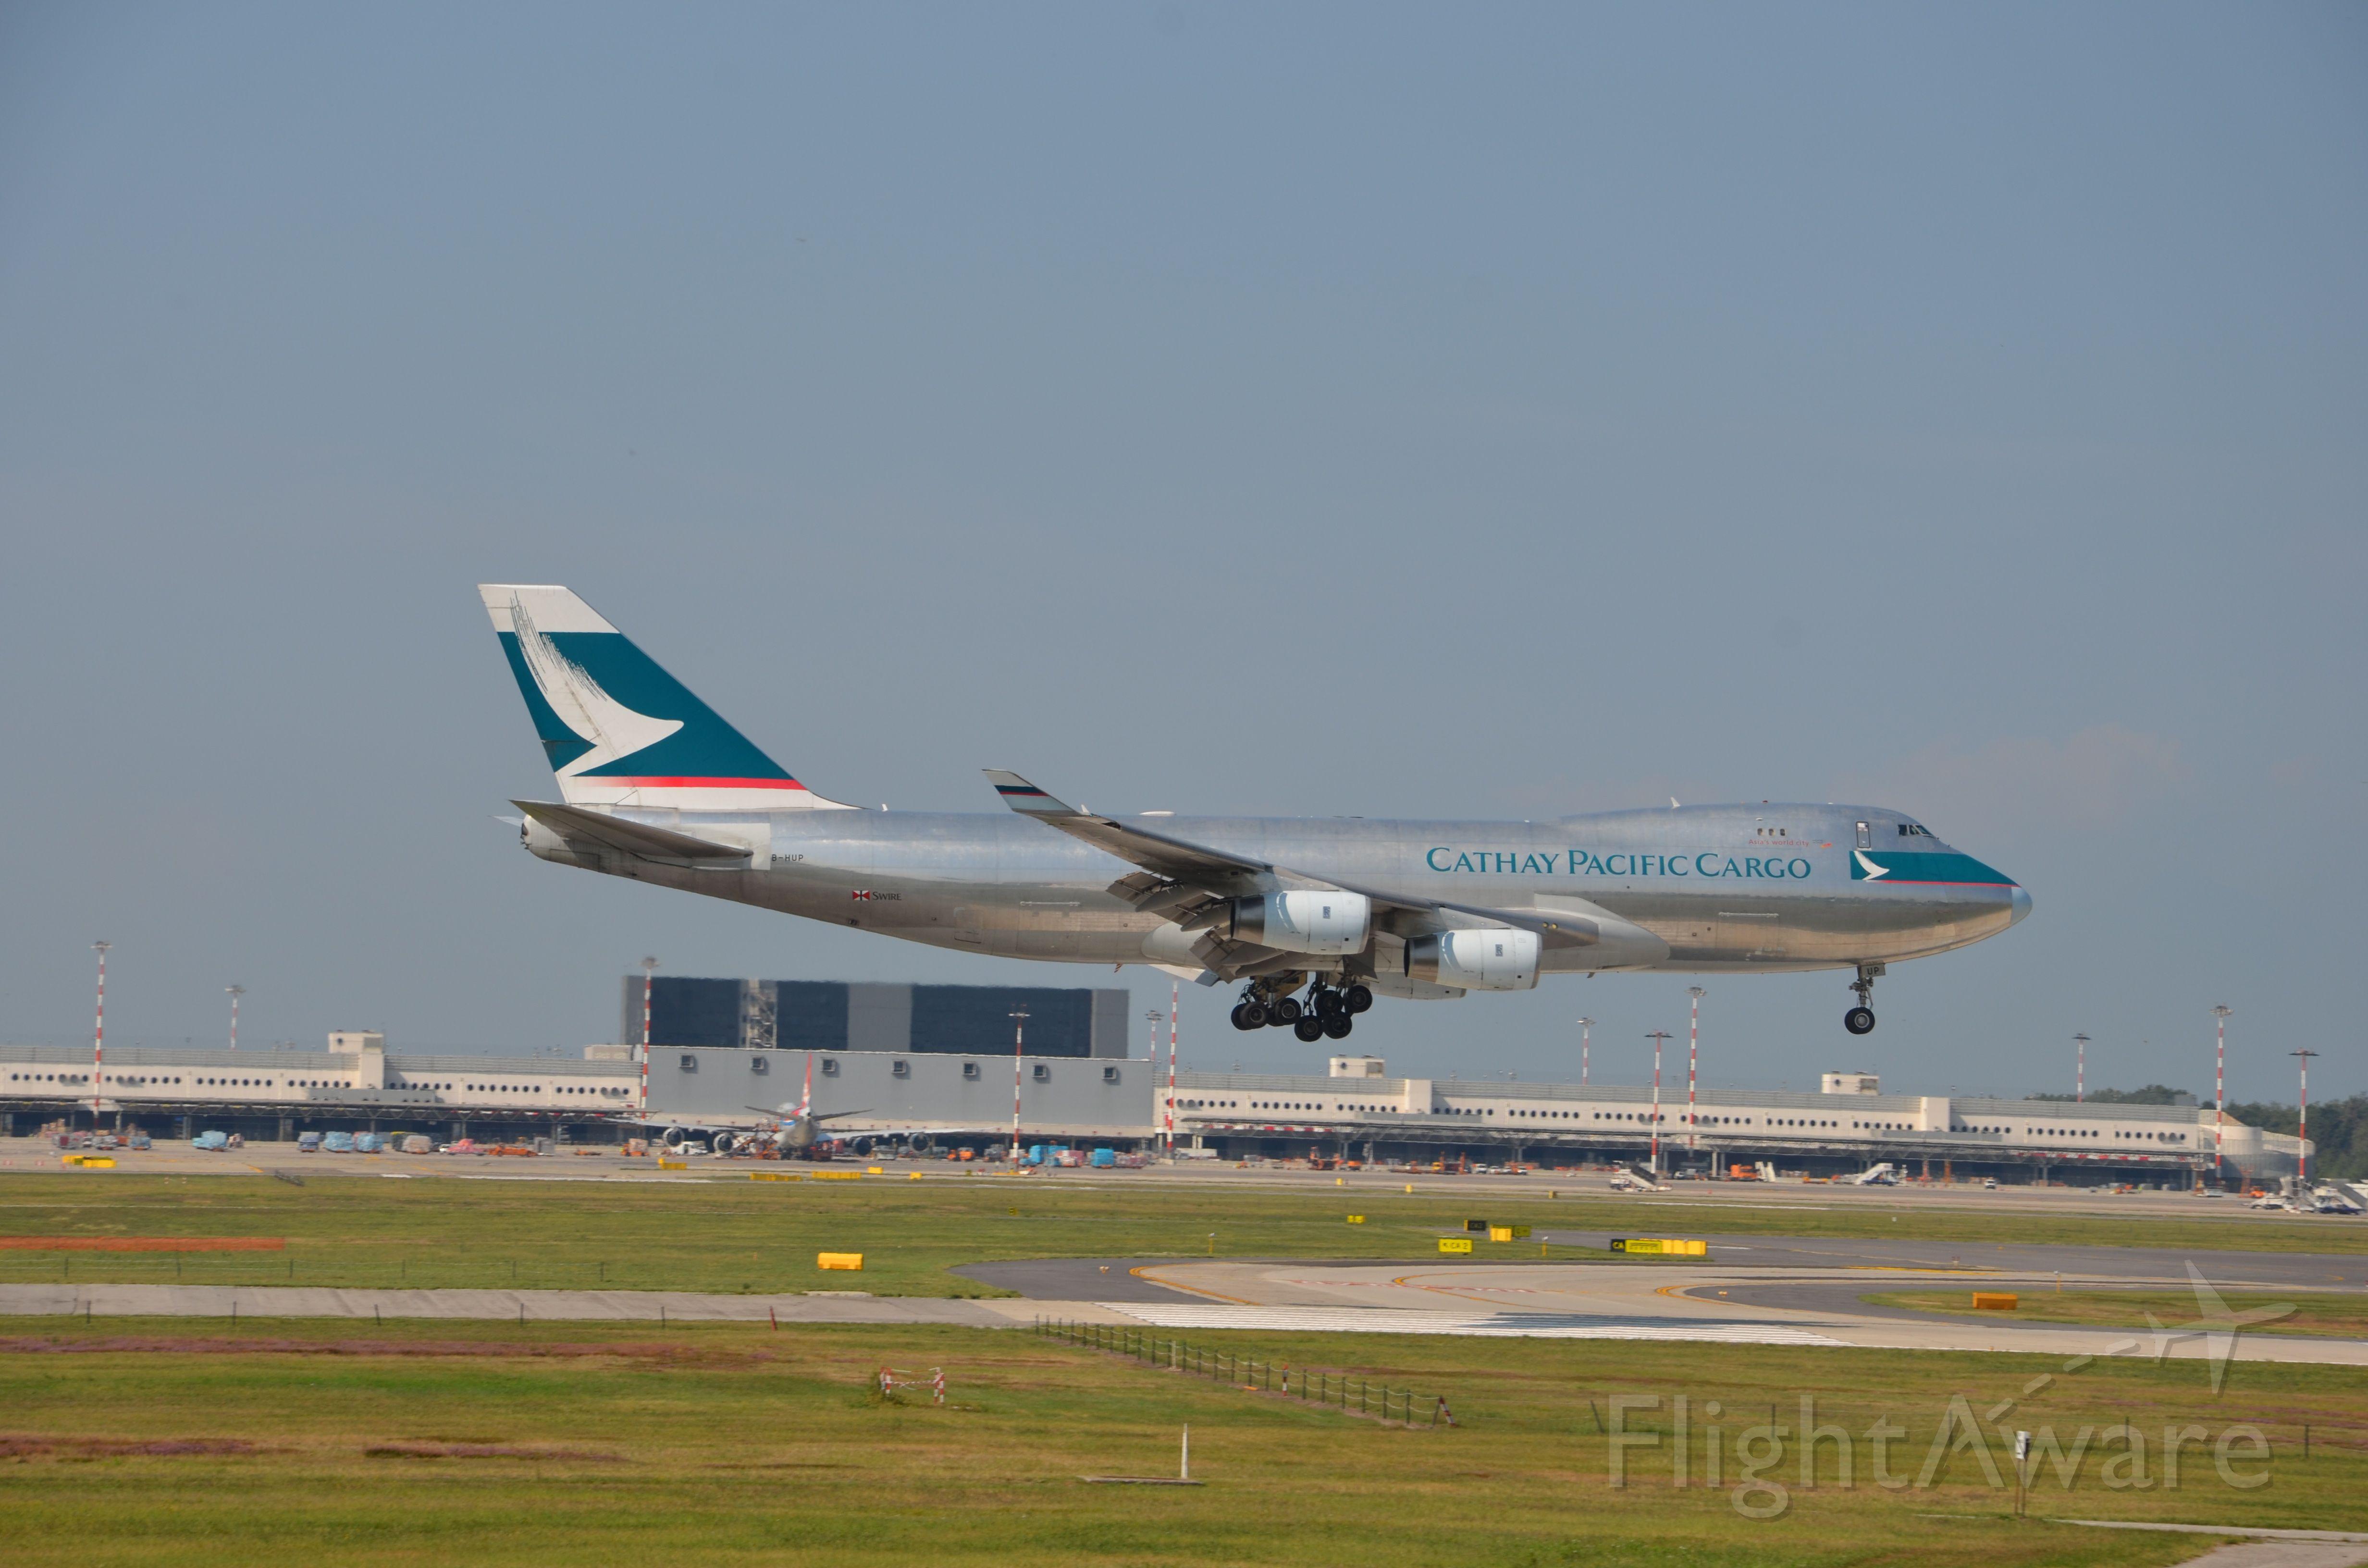 Boeing 747-200 (B-HUP)